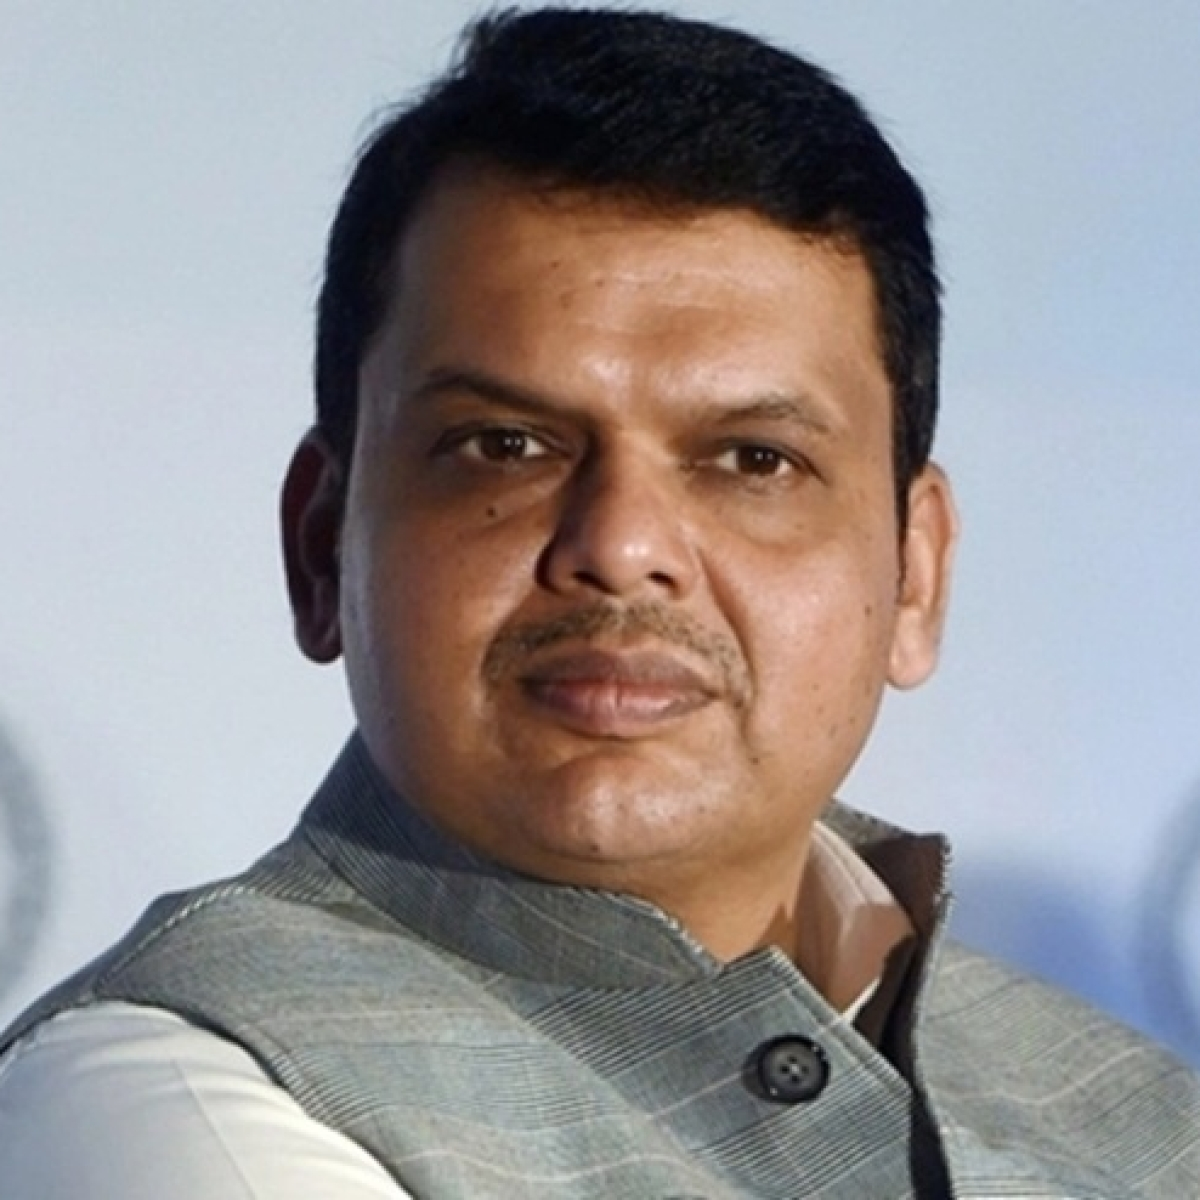 Maharashtra CM Devendra Fadnavis reshuffles Cabinet, drops 6 Ministers, inducts 13